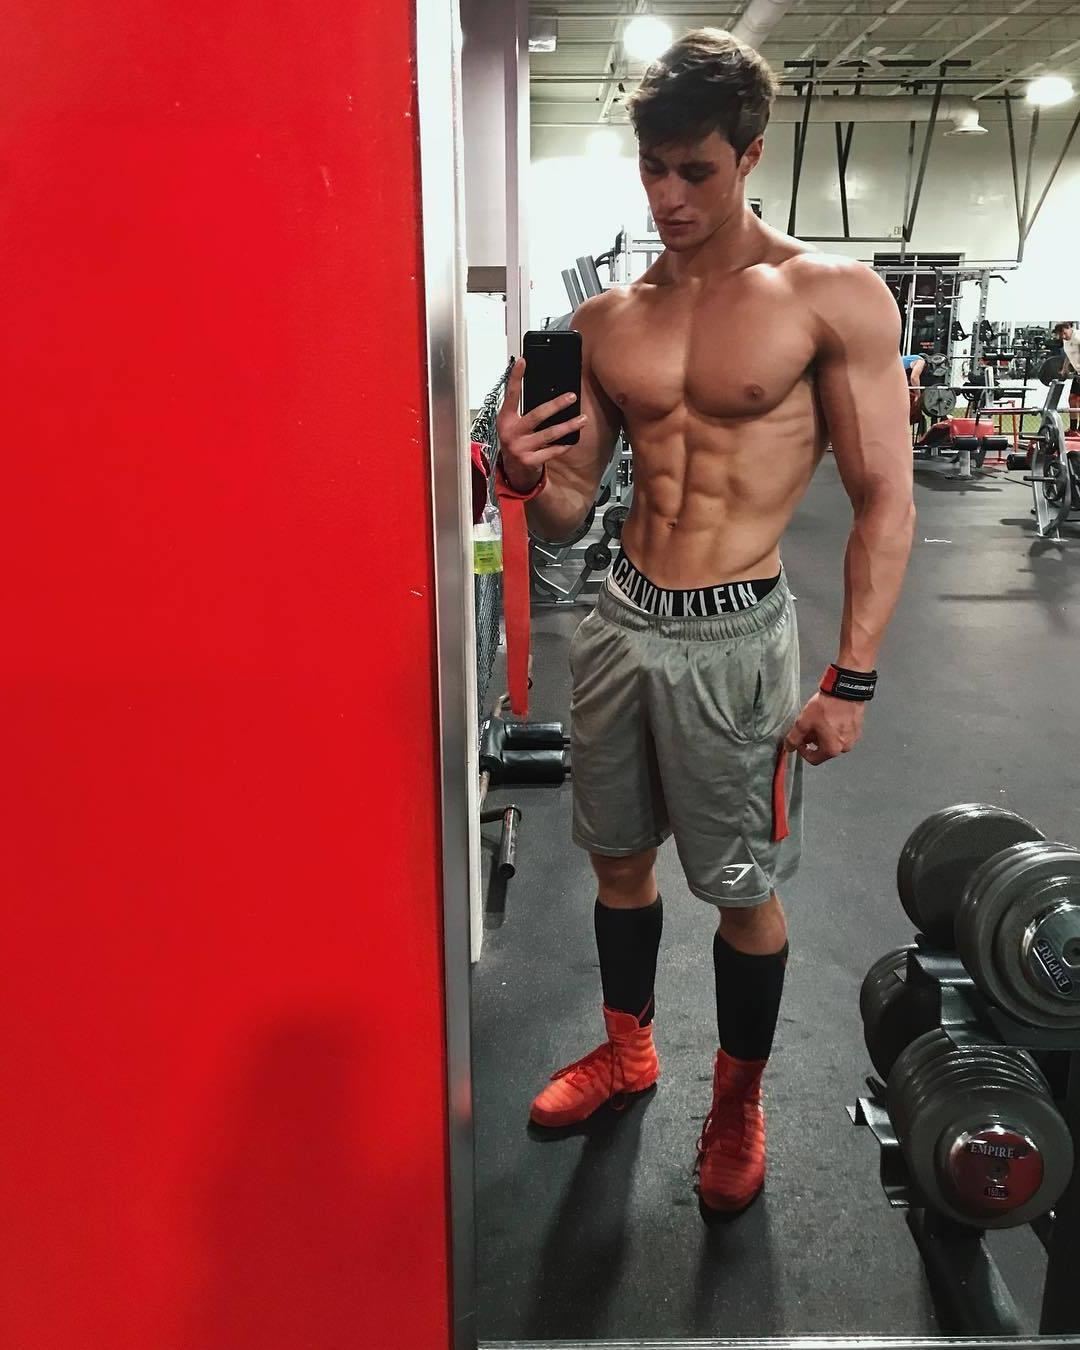 young-college-frat-jock-muscular-bro-sexy-shirtless-gym-selfie